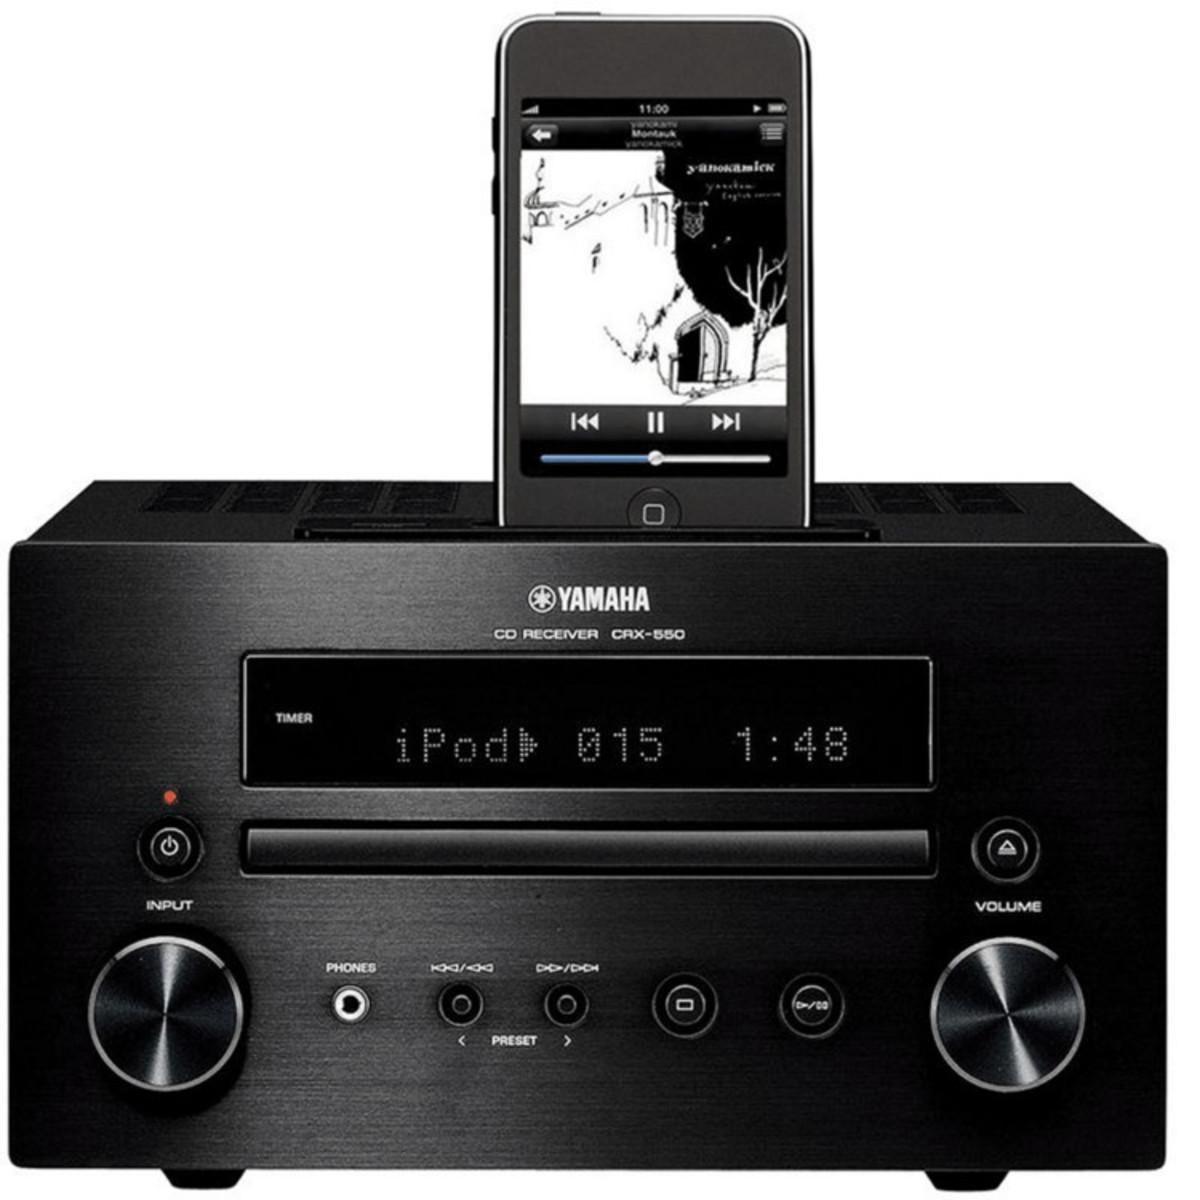 Yamaha crx 550 mini sound system with ipod dock black for Yamaha sound console